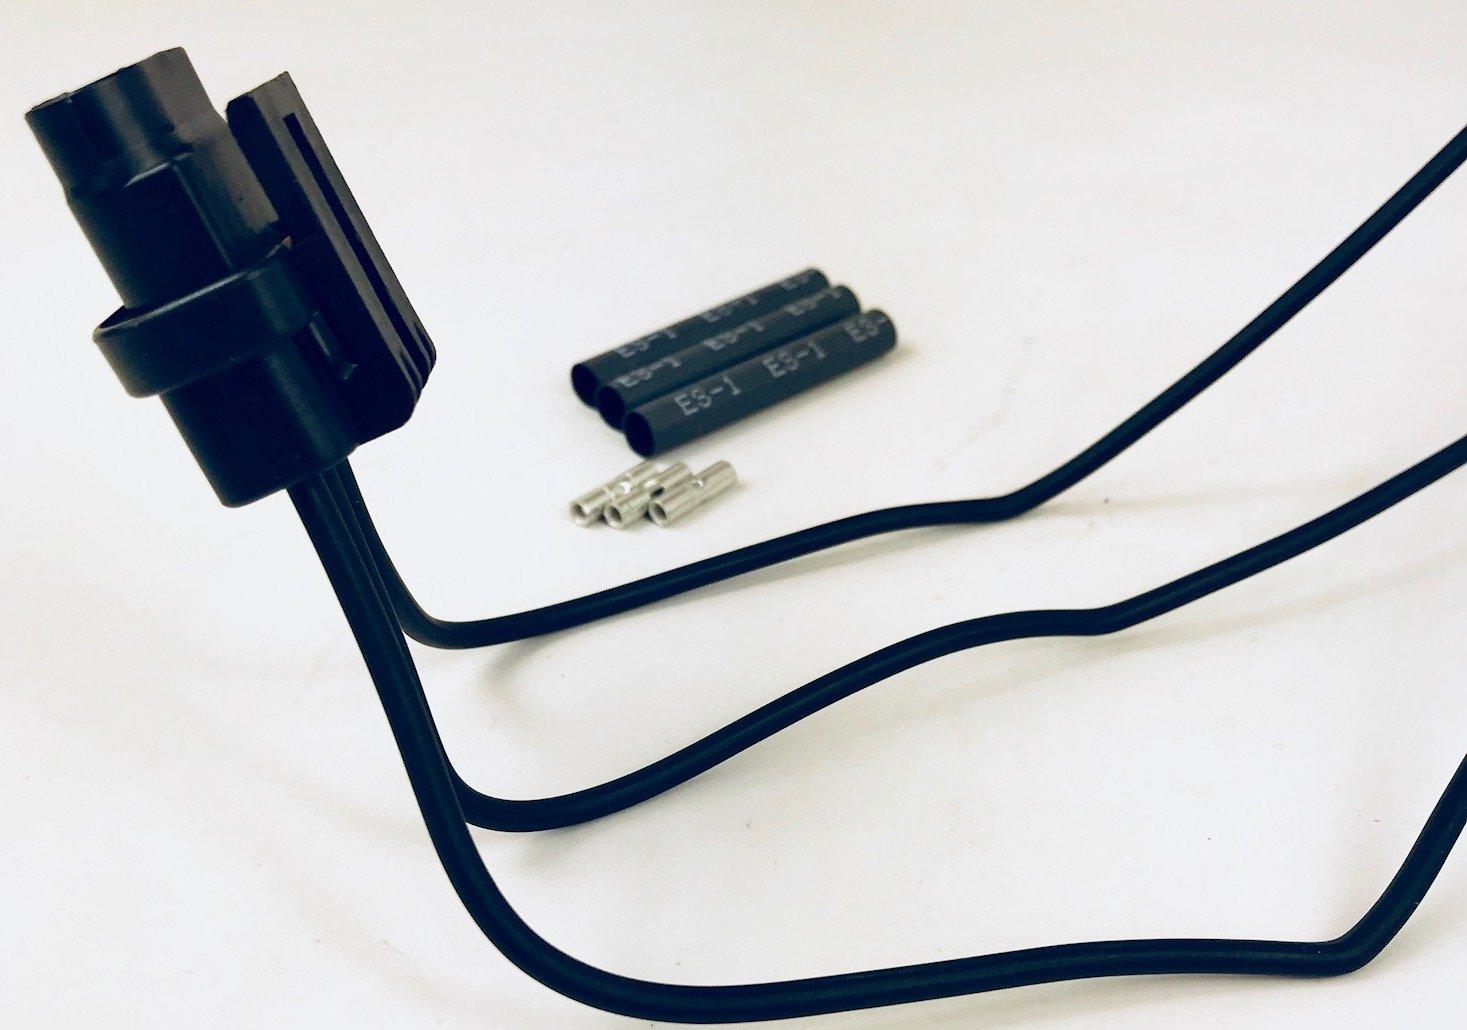 Motorcraft Wpt119 Alternator Connector Automotive 1983 Ford Regulator Wiring